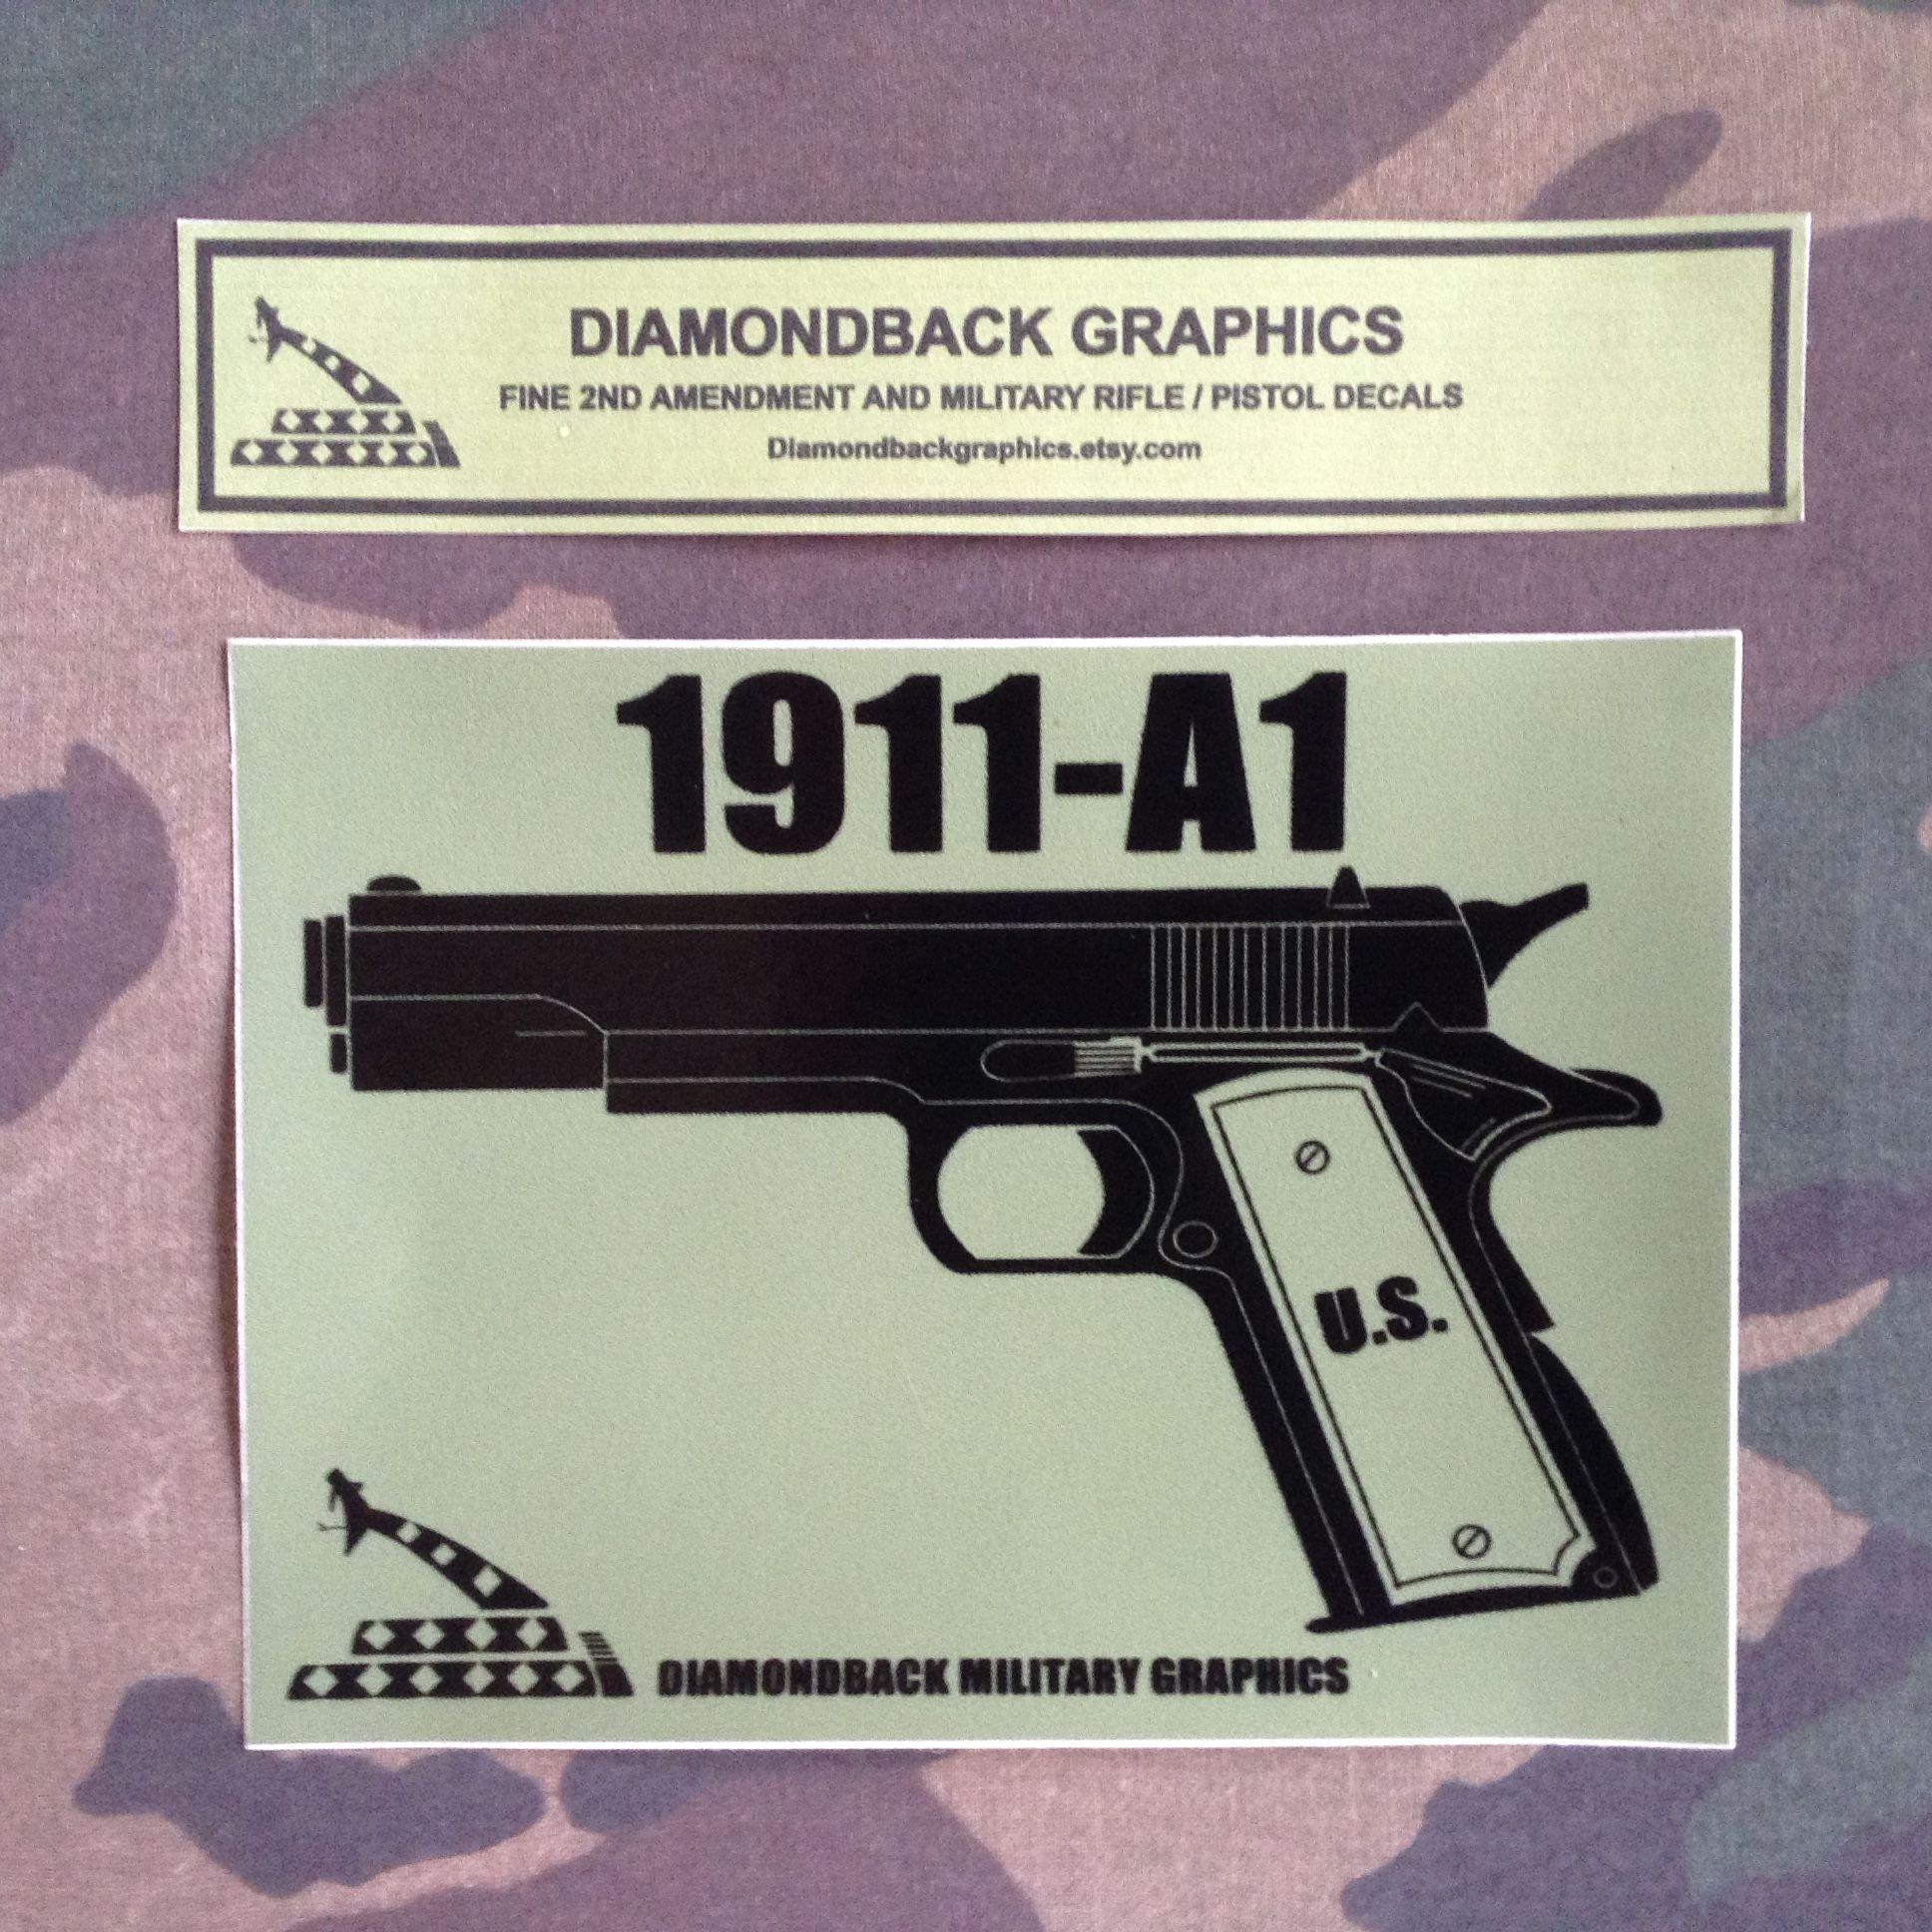 Decal Available At Diamondbackgraphicsetsycom Guns That I - Custom gun barrel stickersgun decals shotgun barrel sticker shooting ammo decal